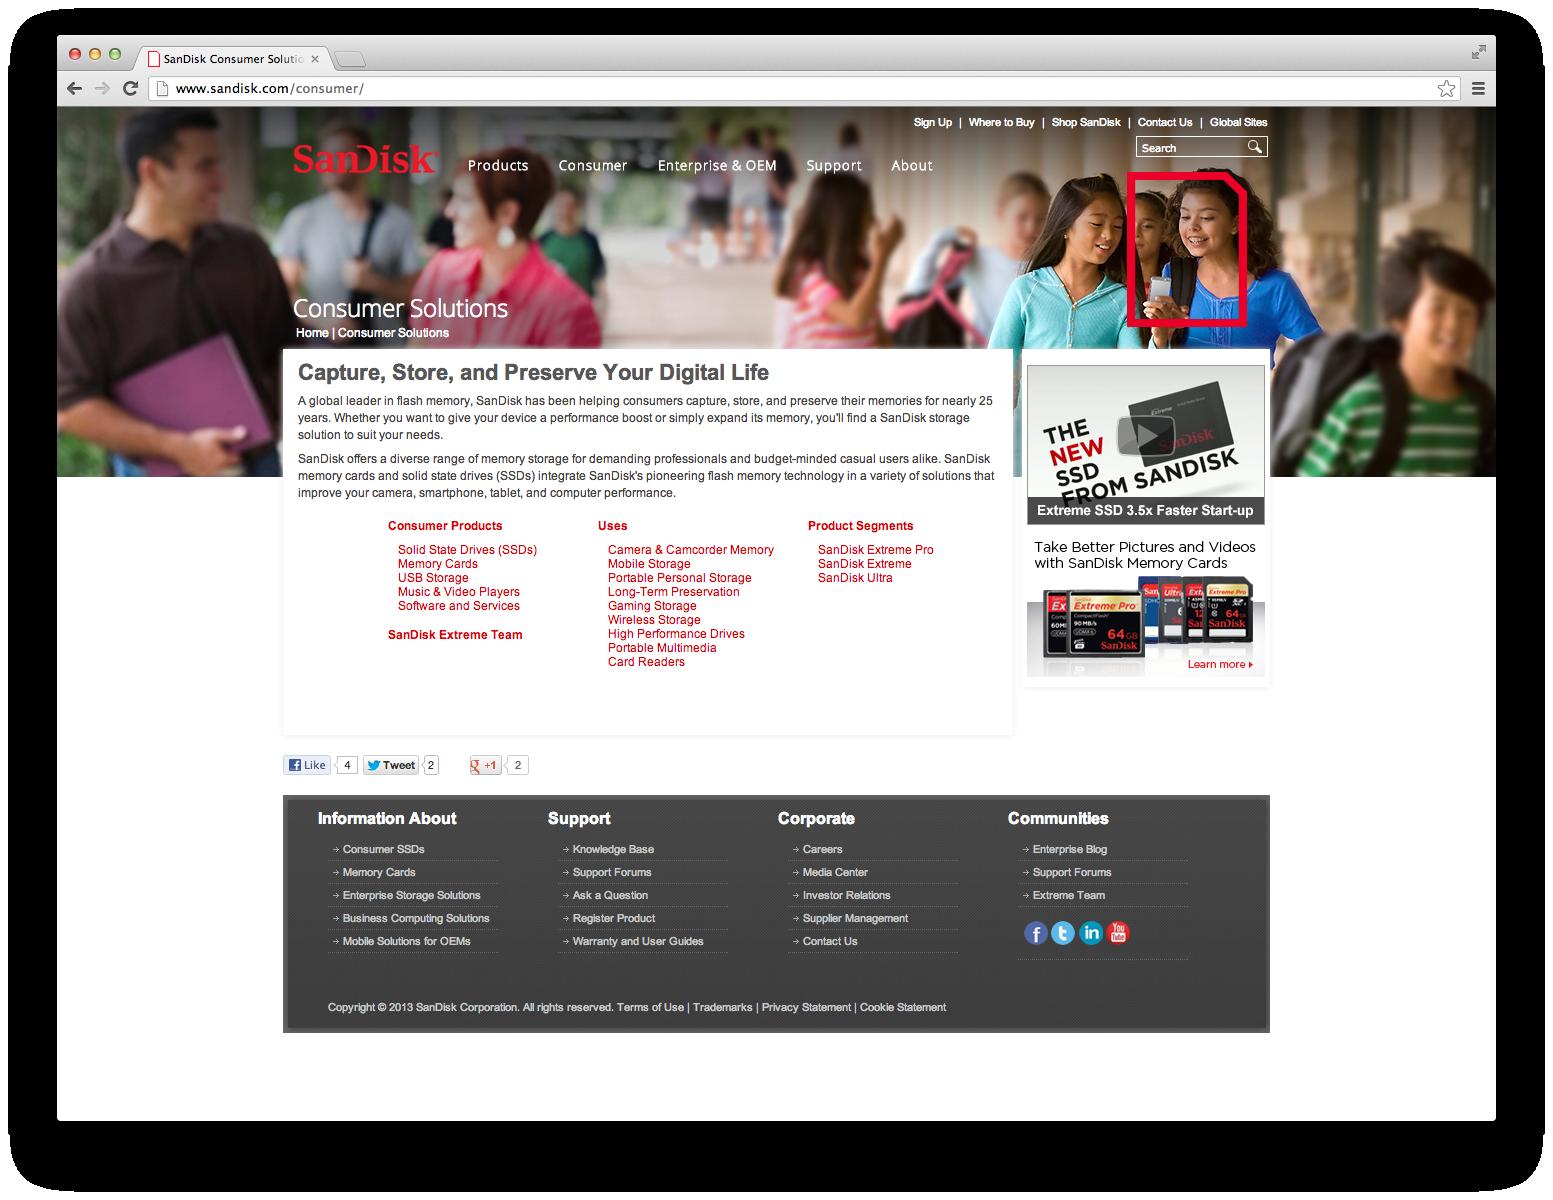 SanDisk_Consumer_ScreenShot.png